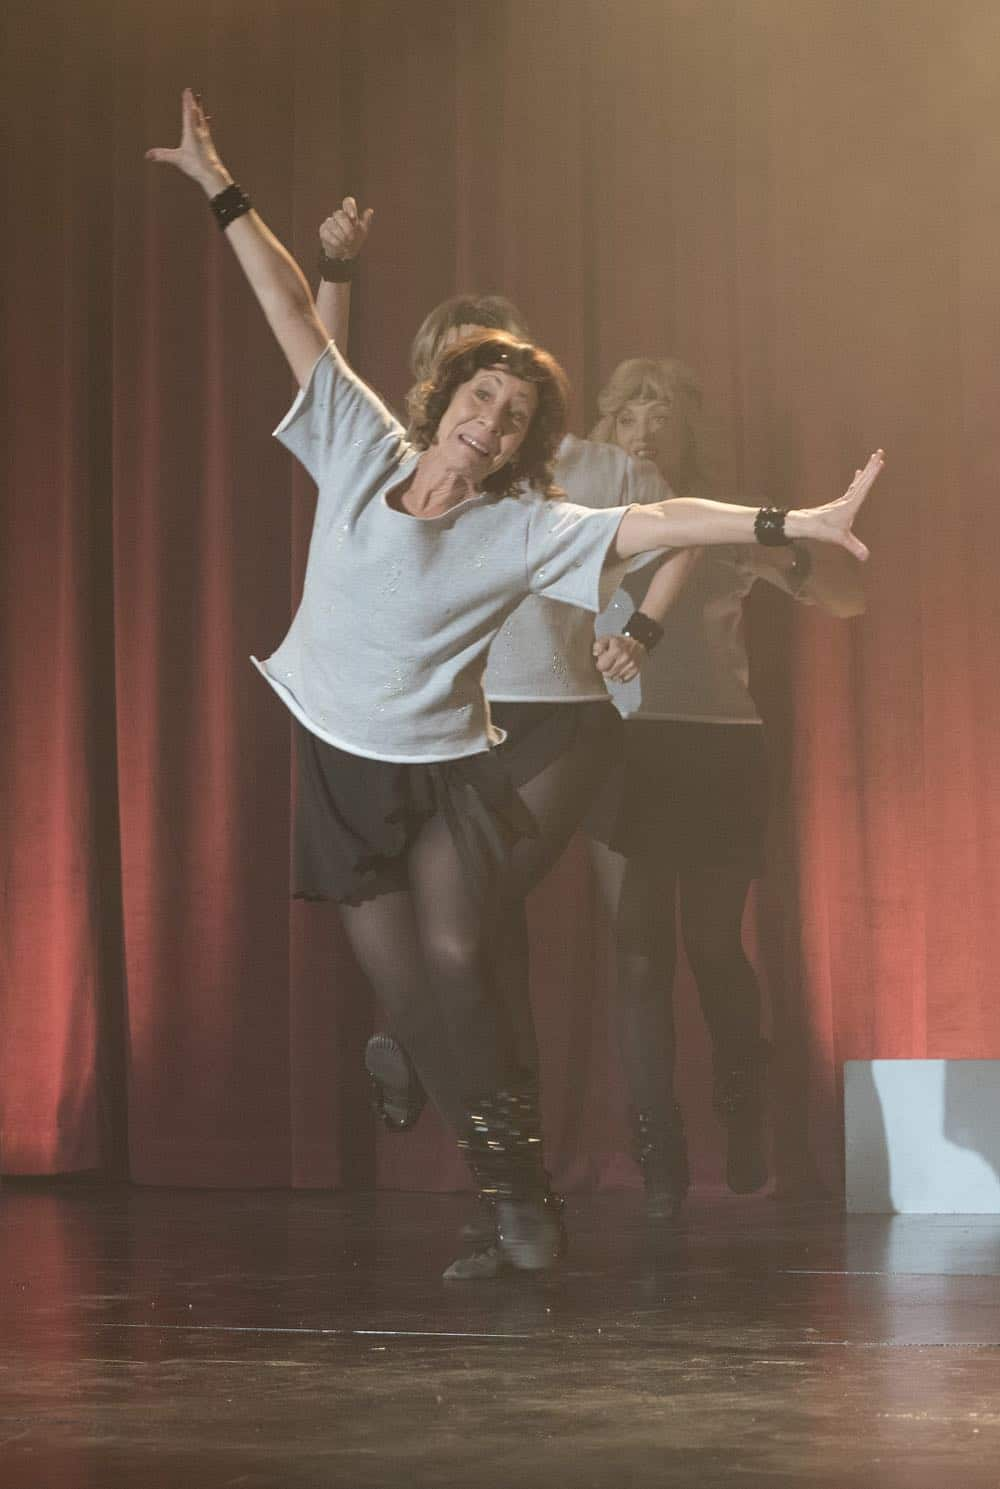 The Goldbergs Episode 19 Season 5 Flashy Little Flashdancer 46